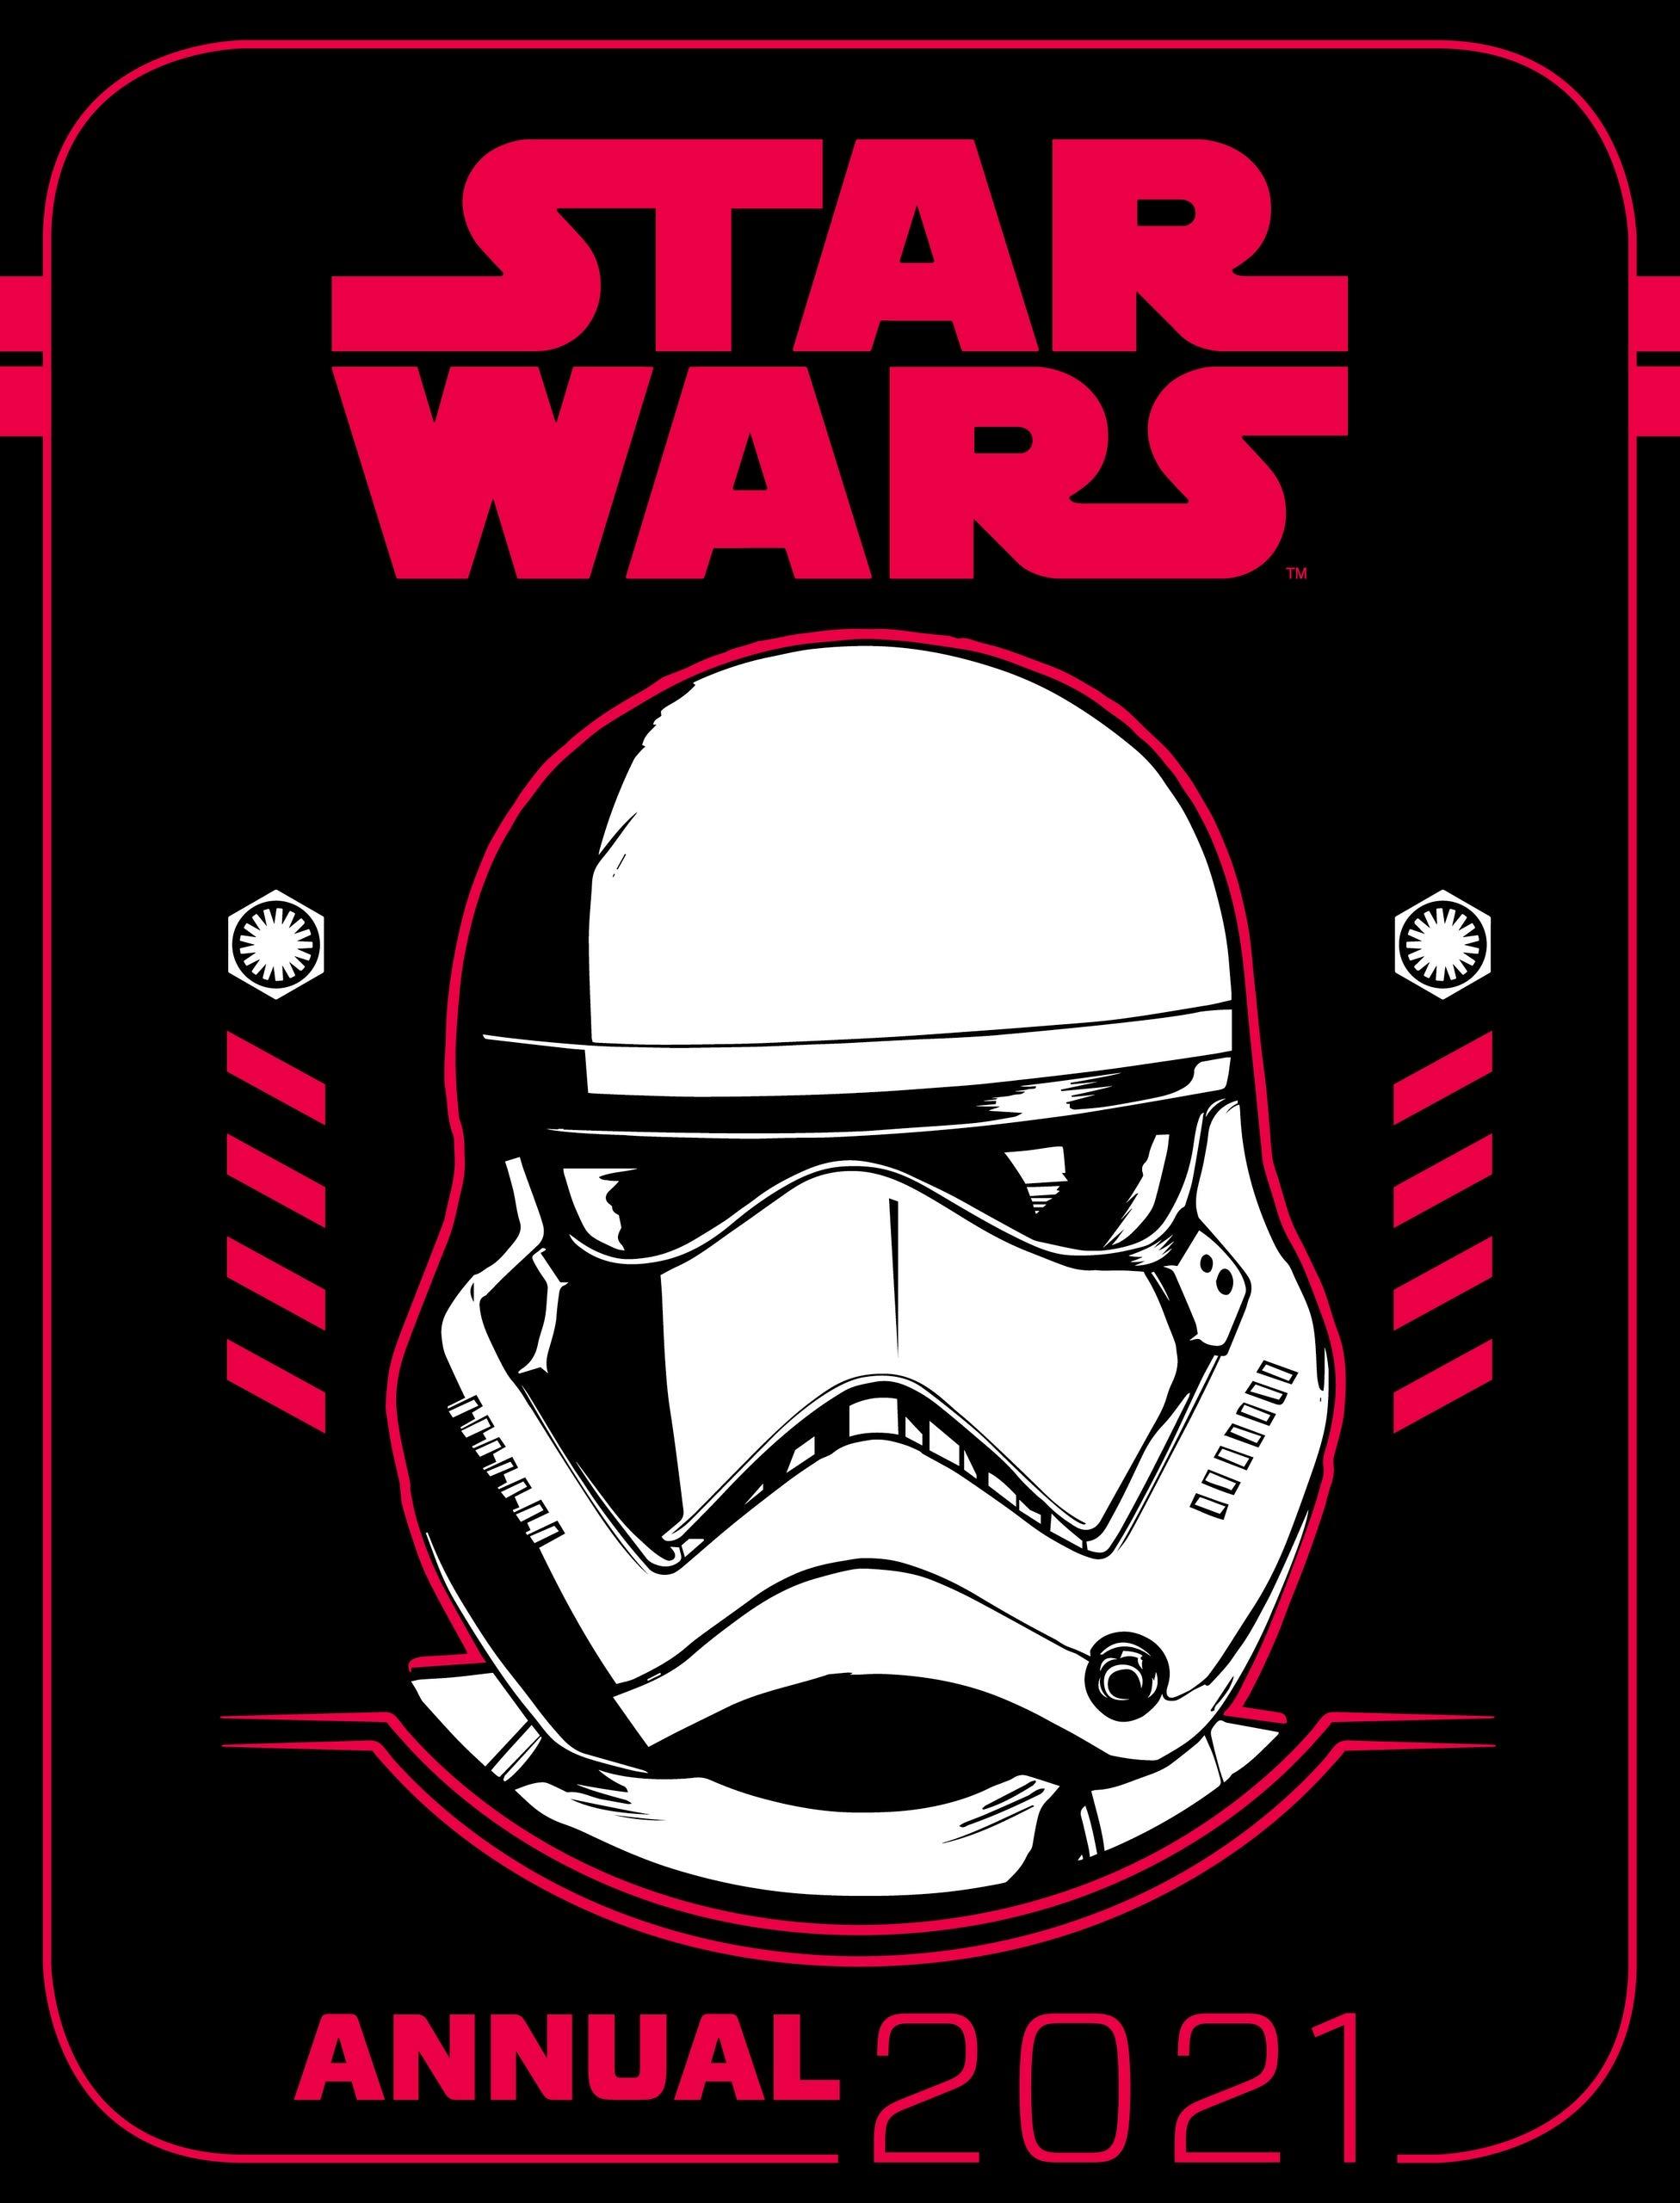 Star Wars Köln 2021